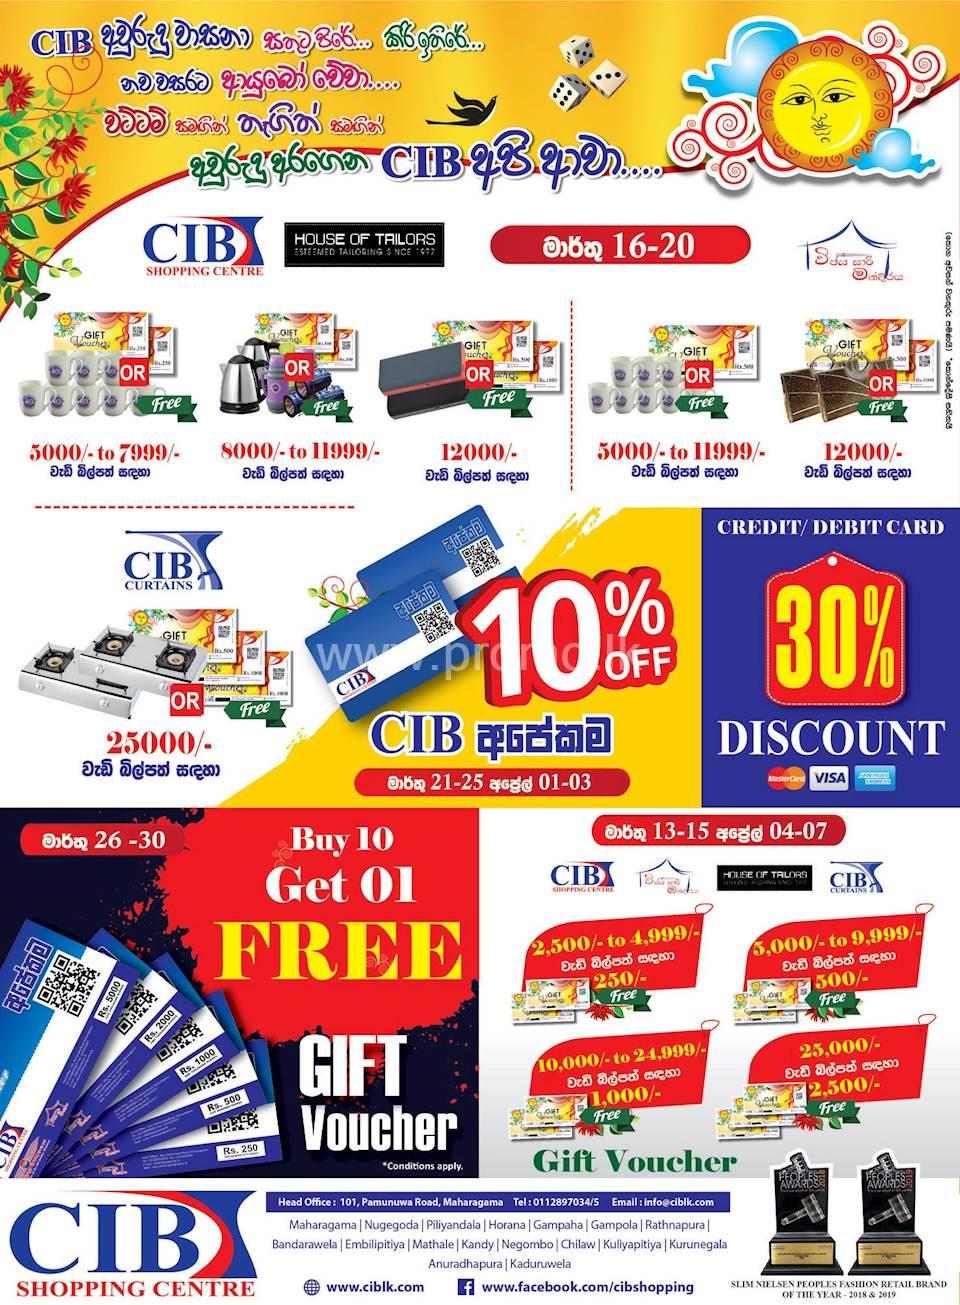 Avurudu Offers at CIB Shopping Centre